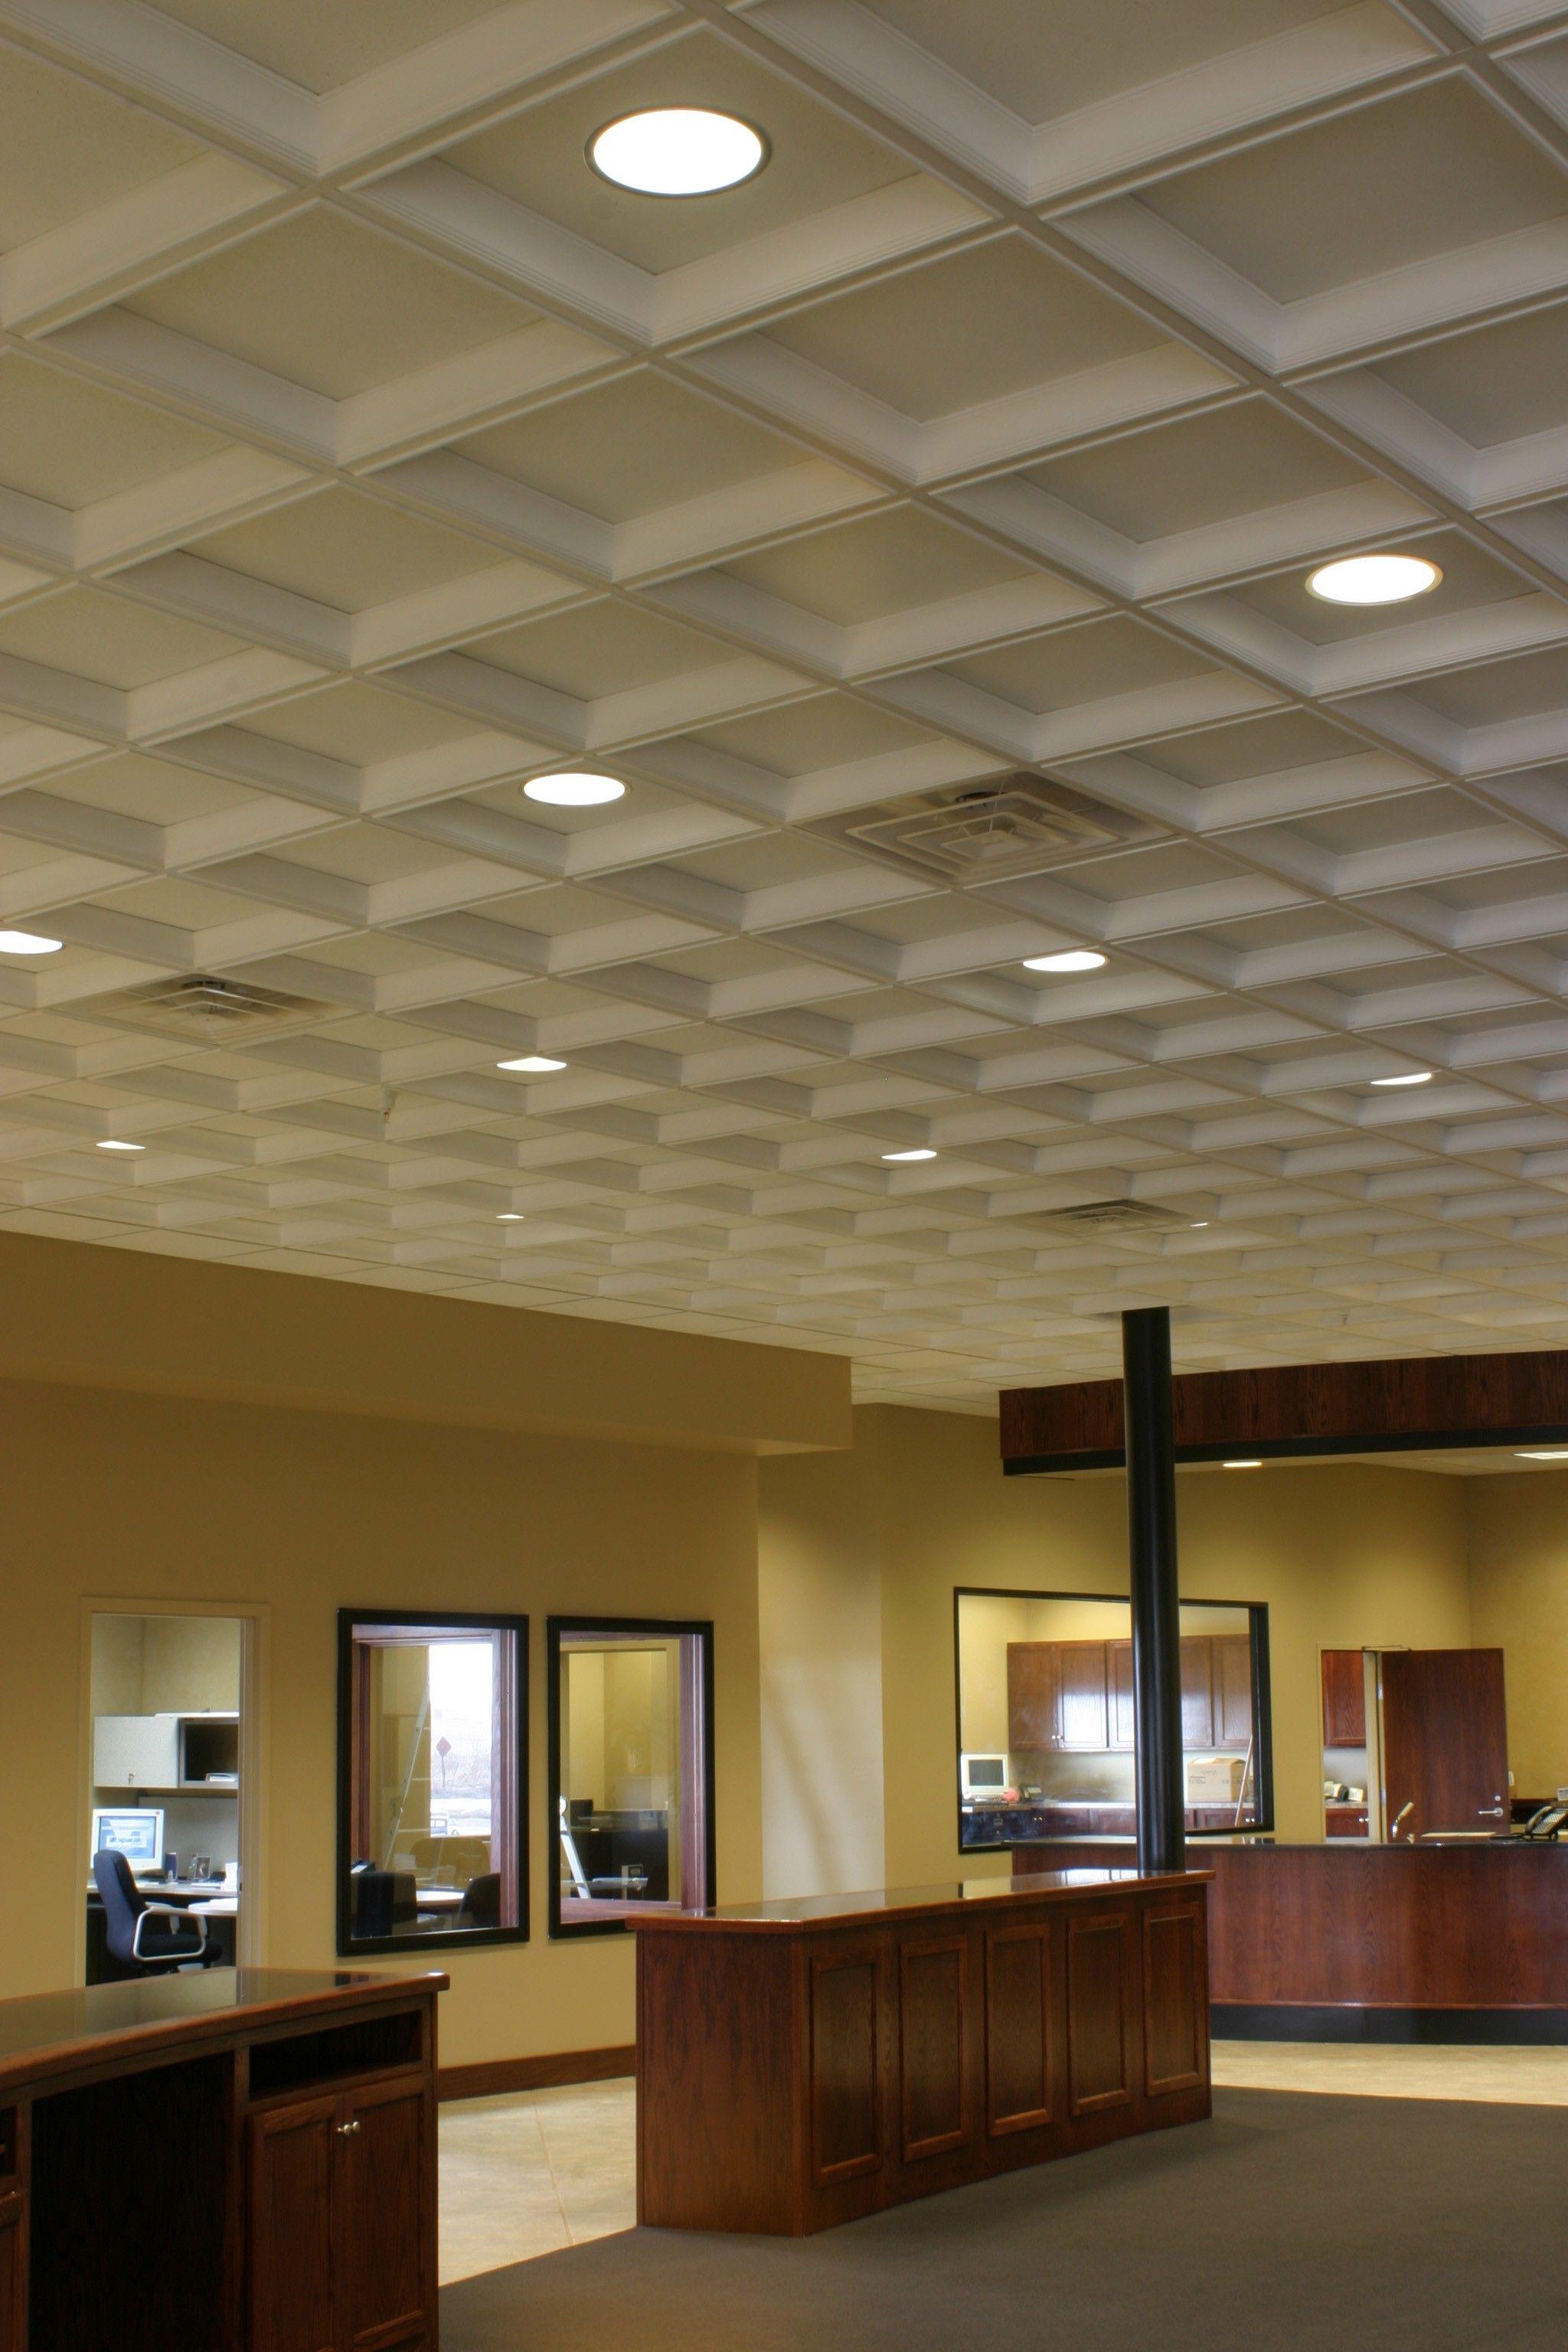 Glass Reinforced Gypsum Ceilings Gypsum Ceiling Coffered Ceiling Ceiling